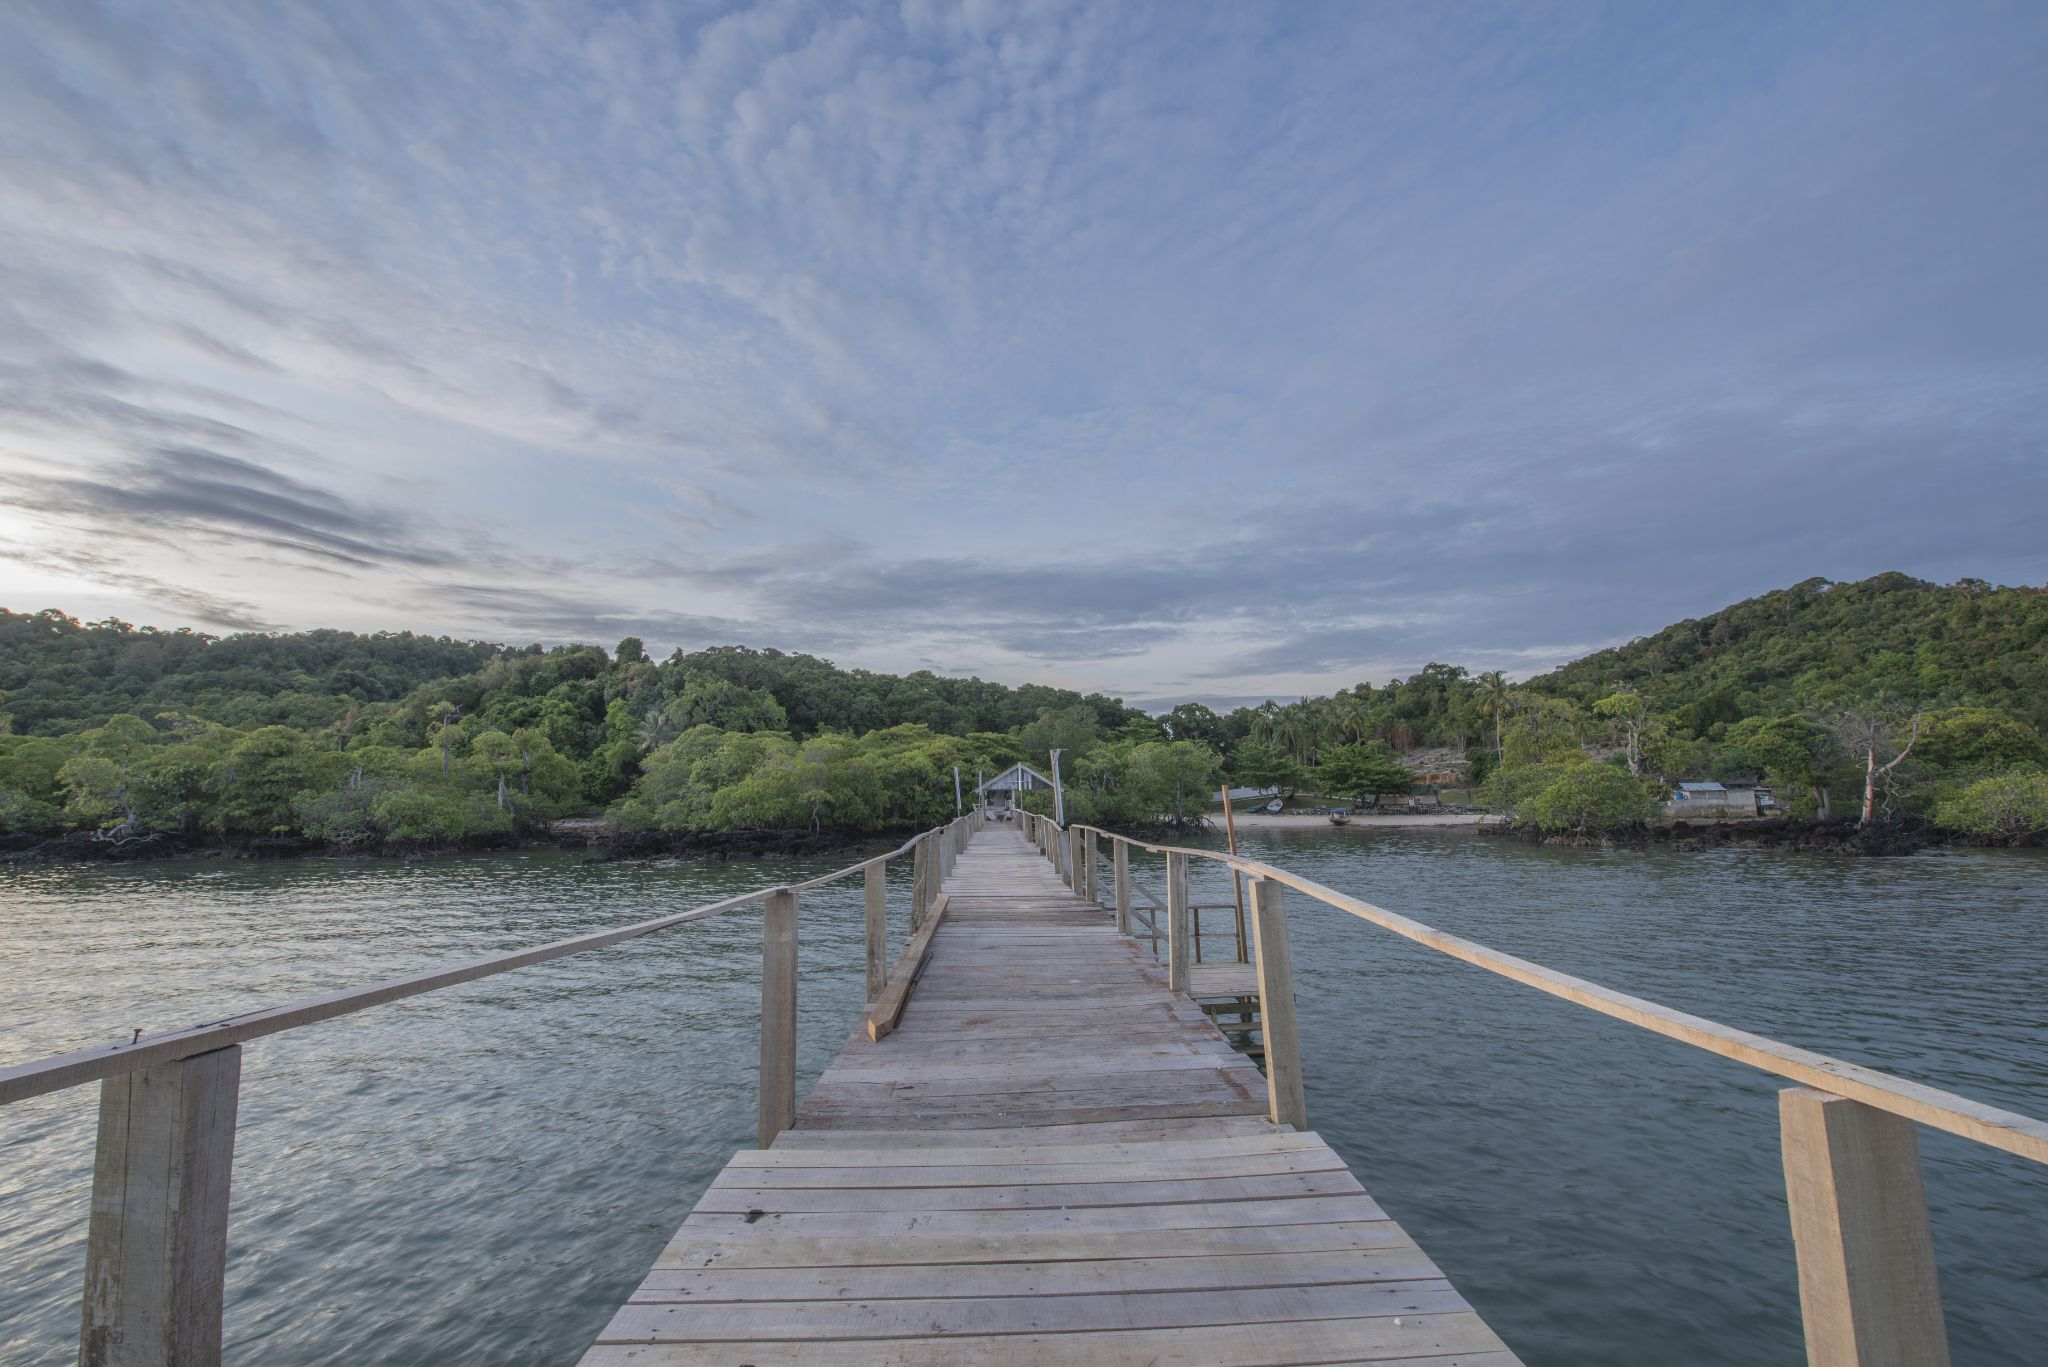 Bridging Friendship by eddylowck